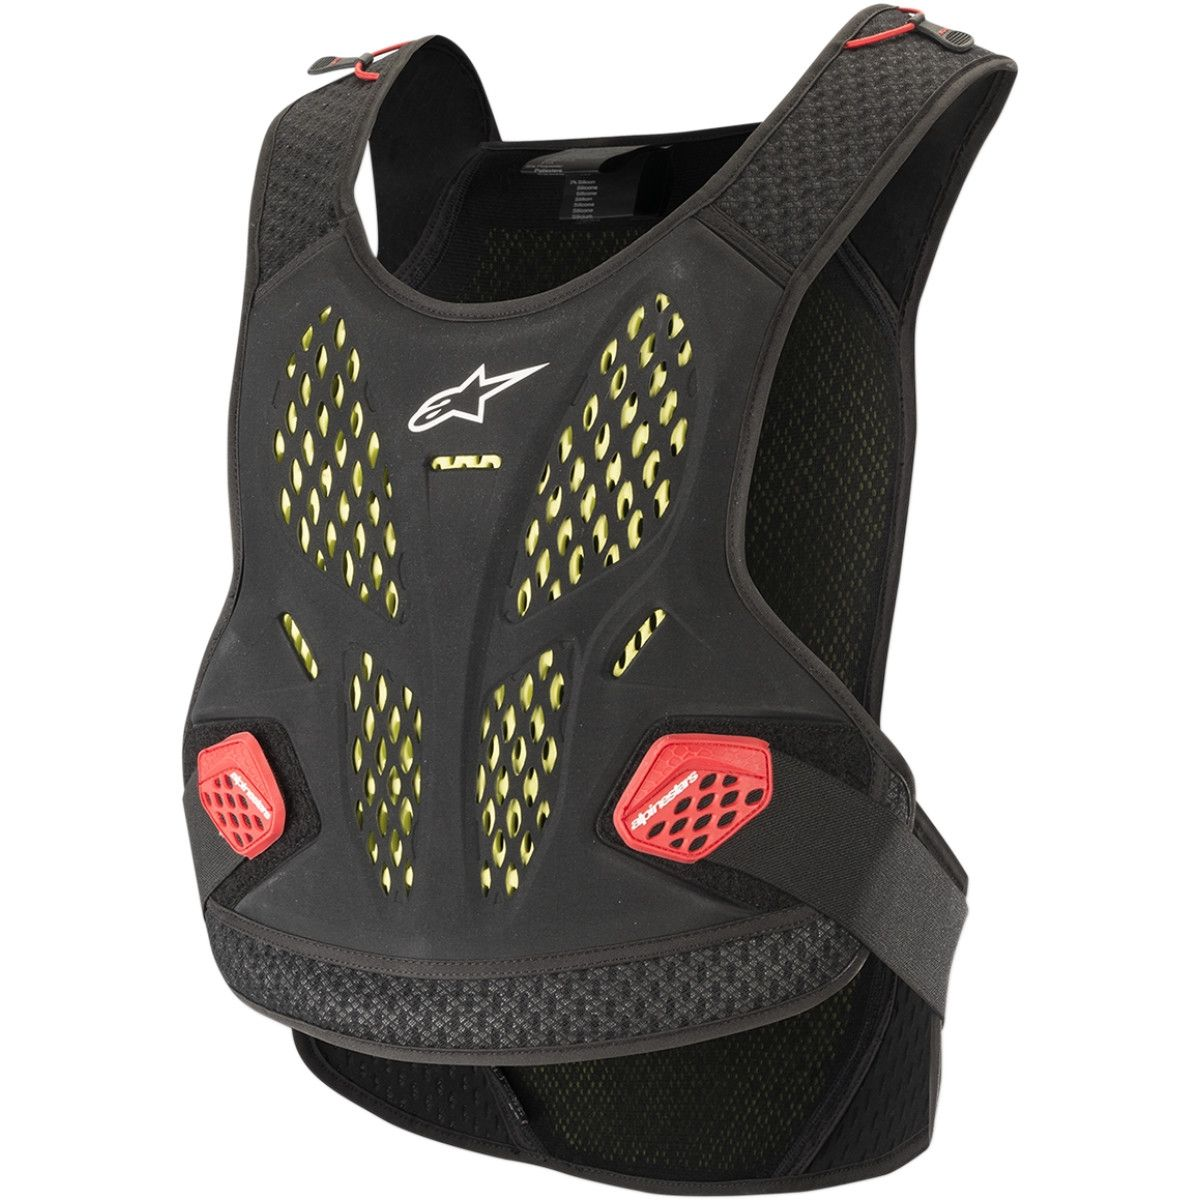 Alpinestars Sequence Bodyprotector Black/Red